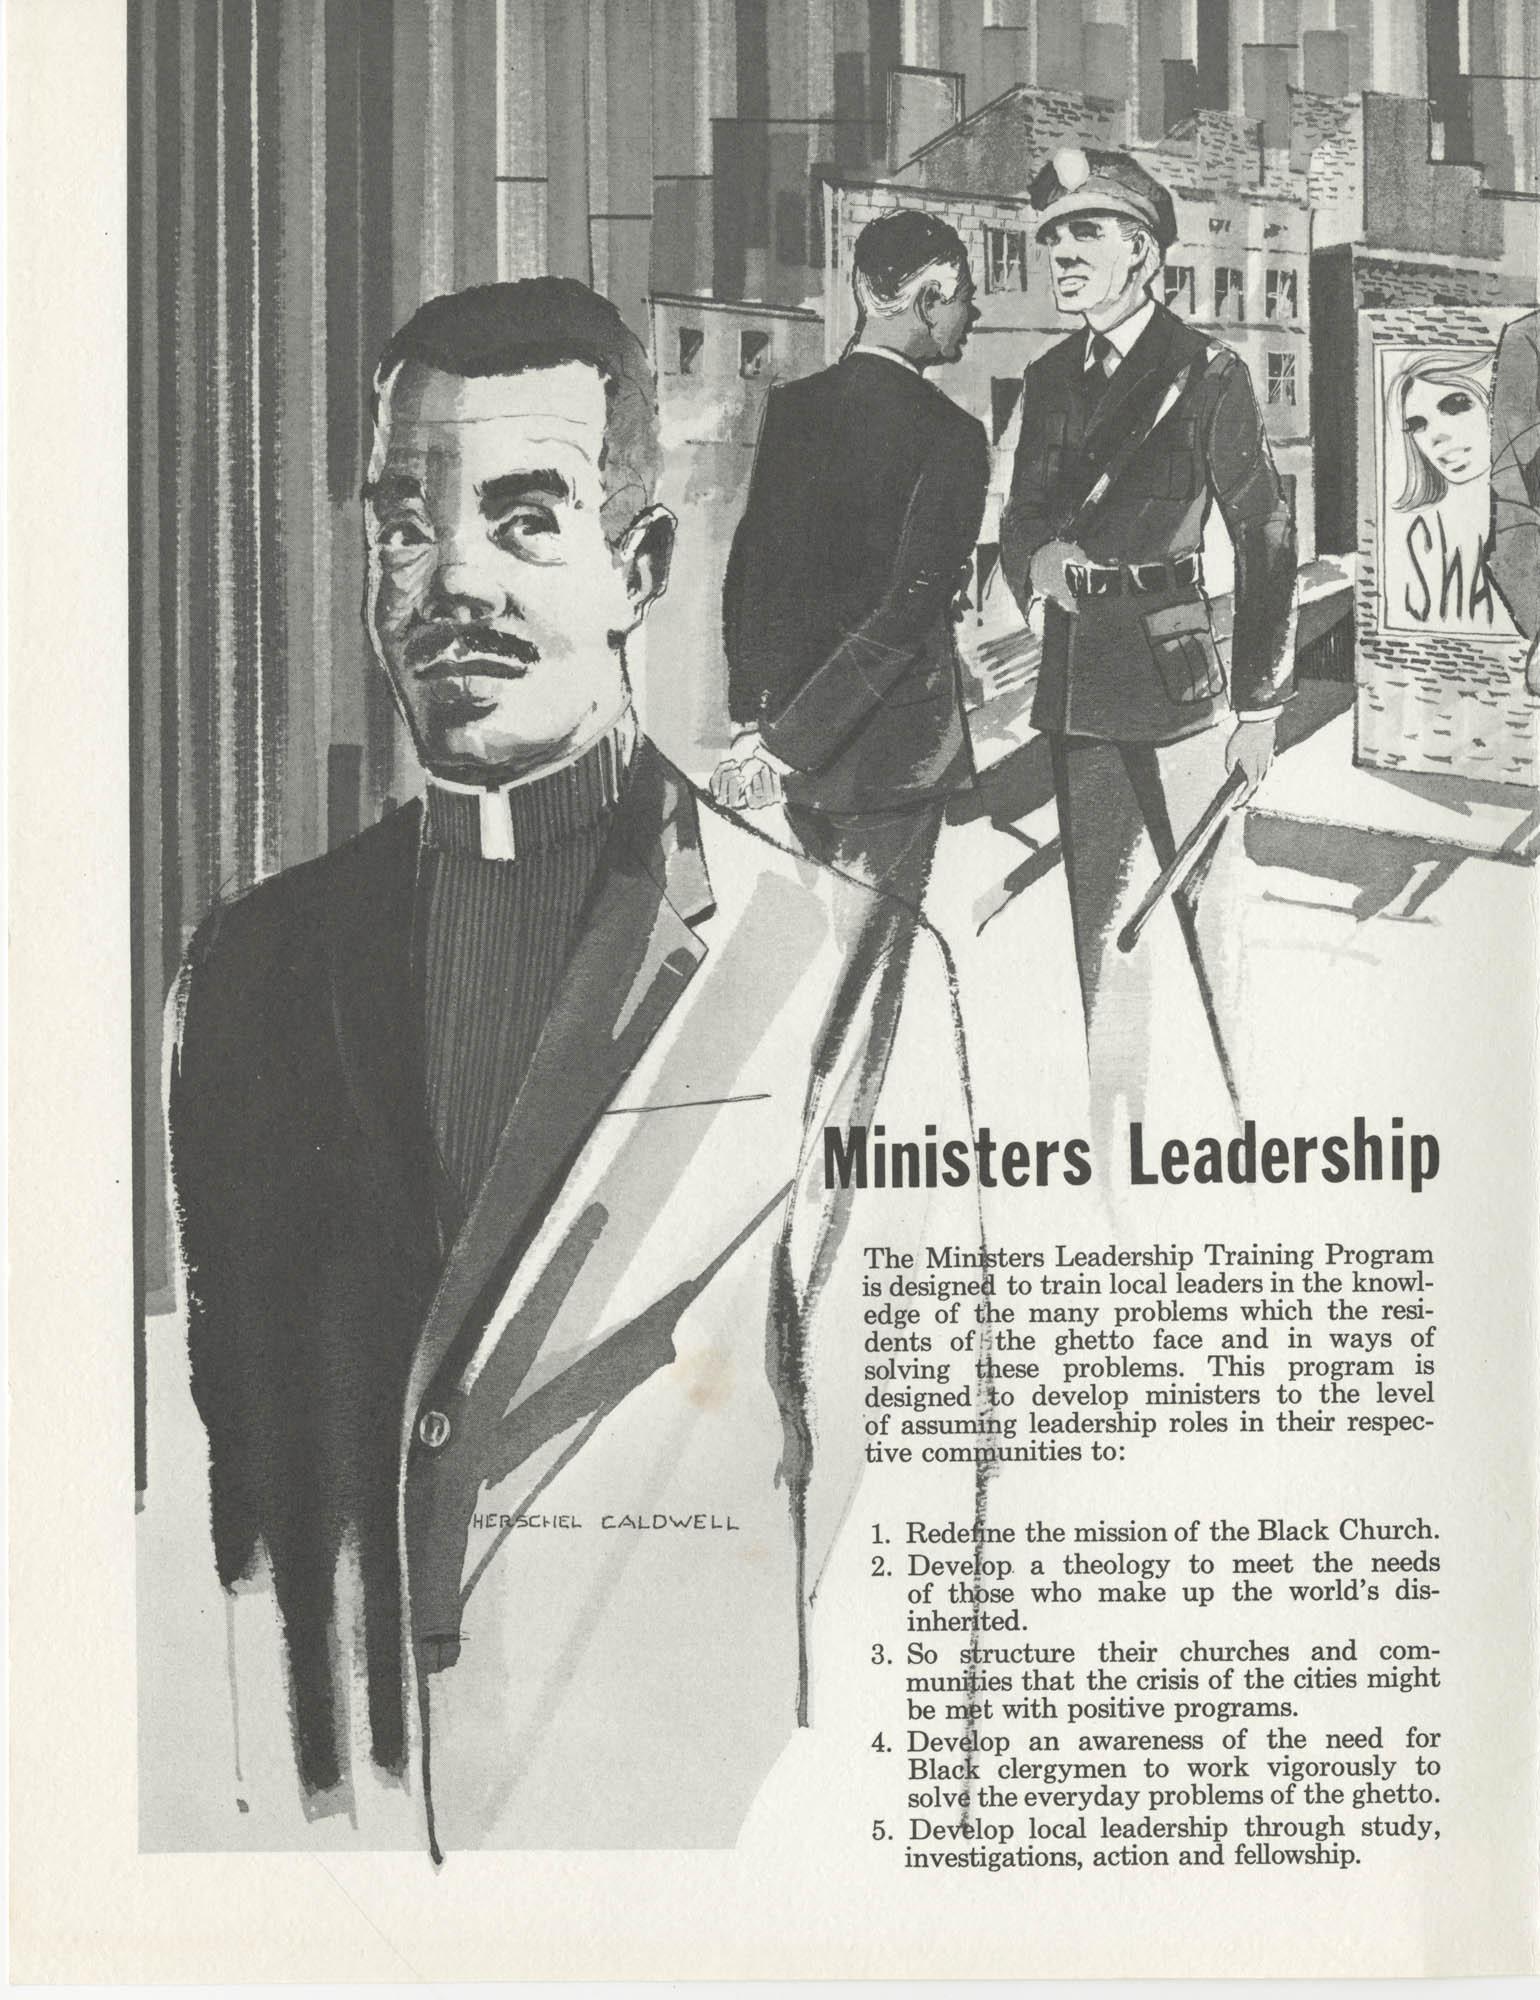 Ministers Leadership Training Program, Page 1